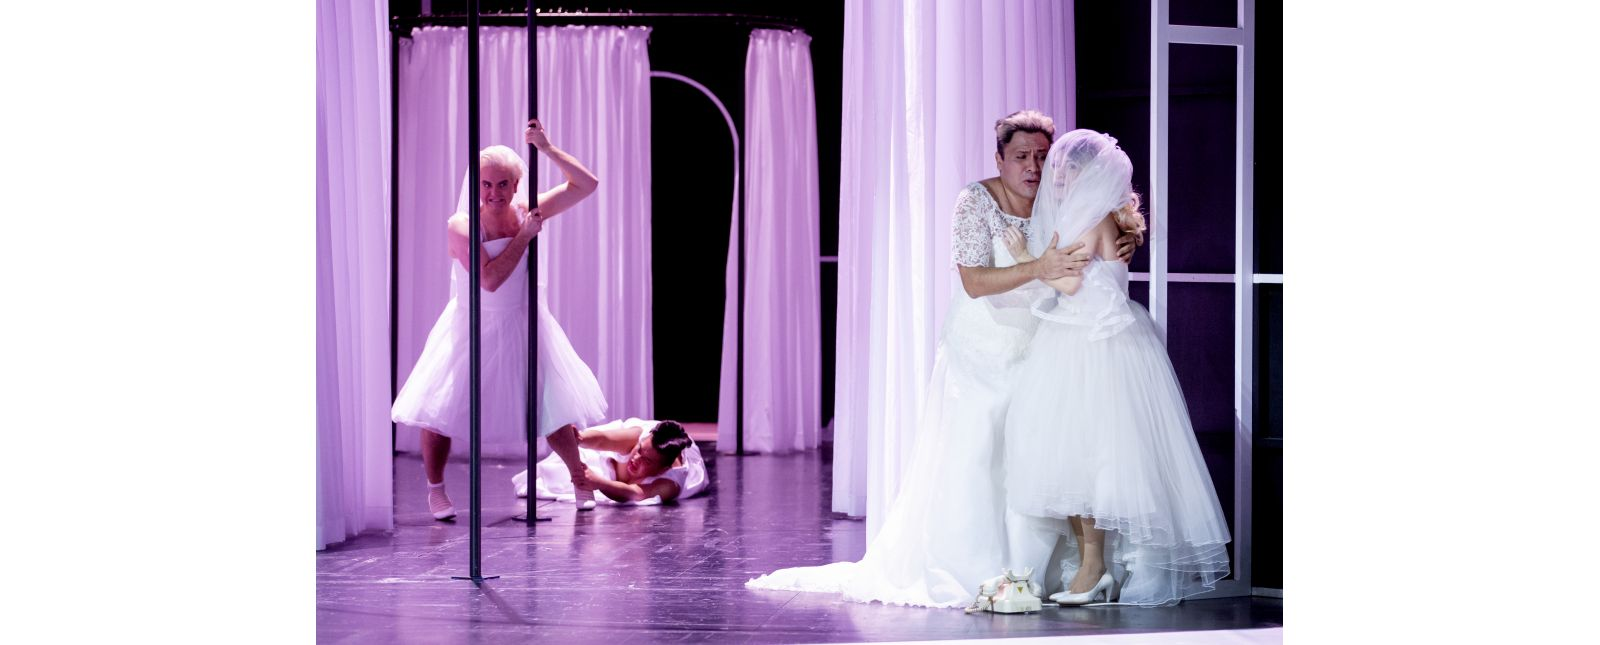 Die Hochzeit des Figaro // Michael Borth / Junbum Lee / Juan Orozco / Katharina Ruckgaber // 2020 // Rainer Muranyi